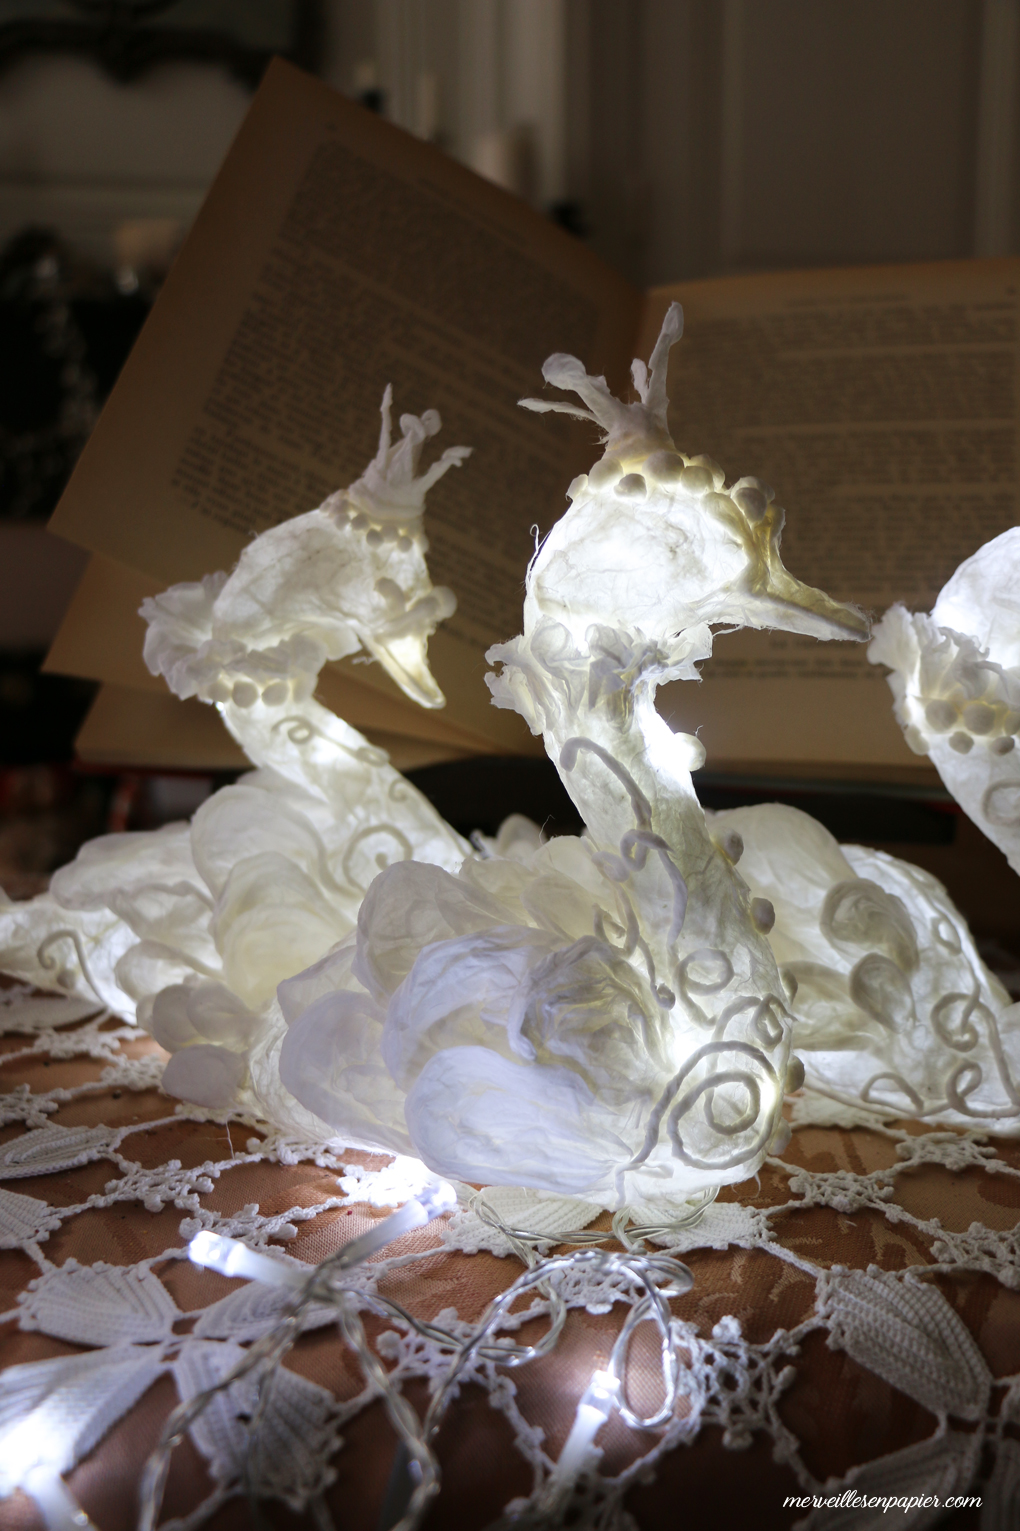 Paper Swans Ligfhts - Nutcracker workshop